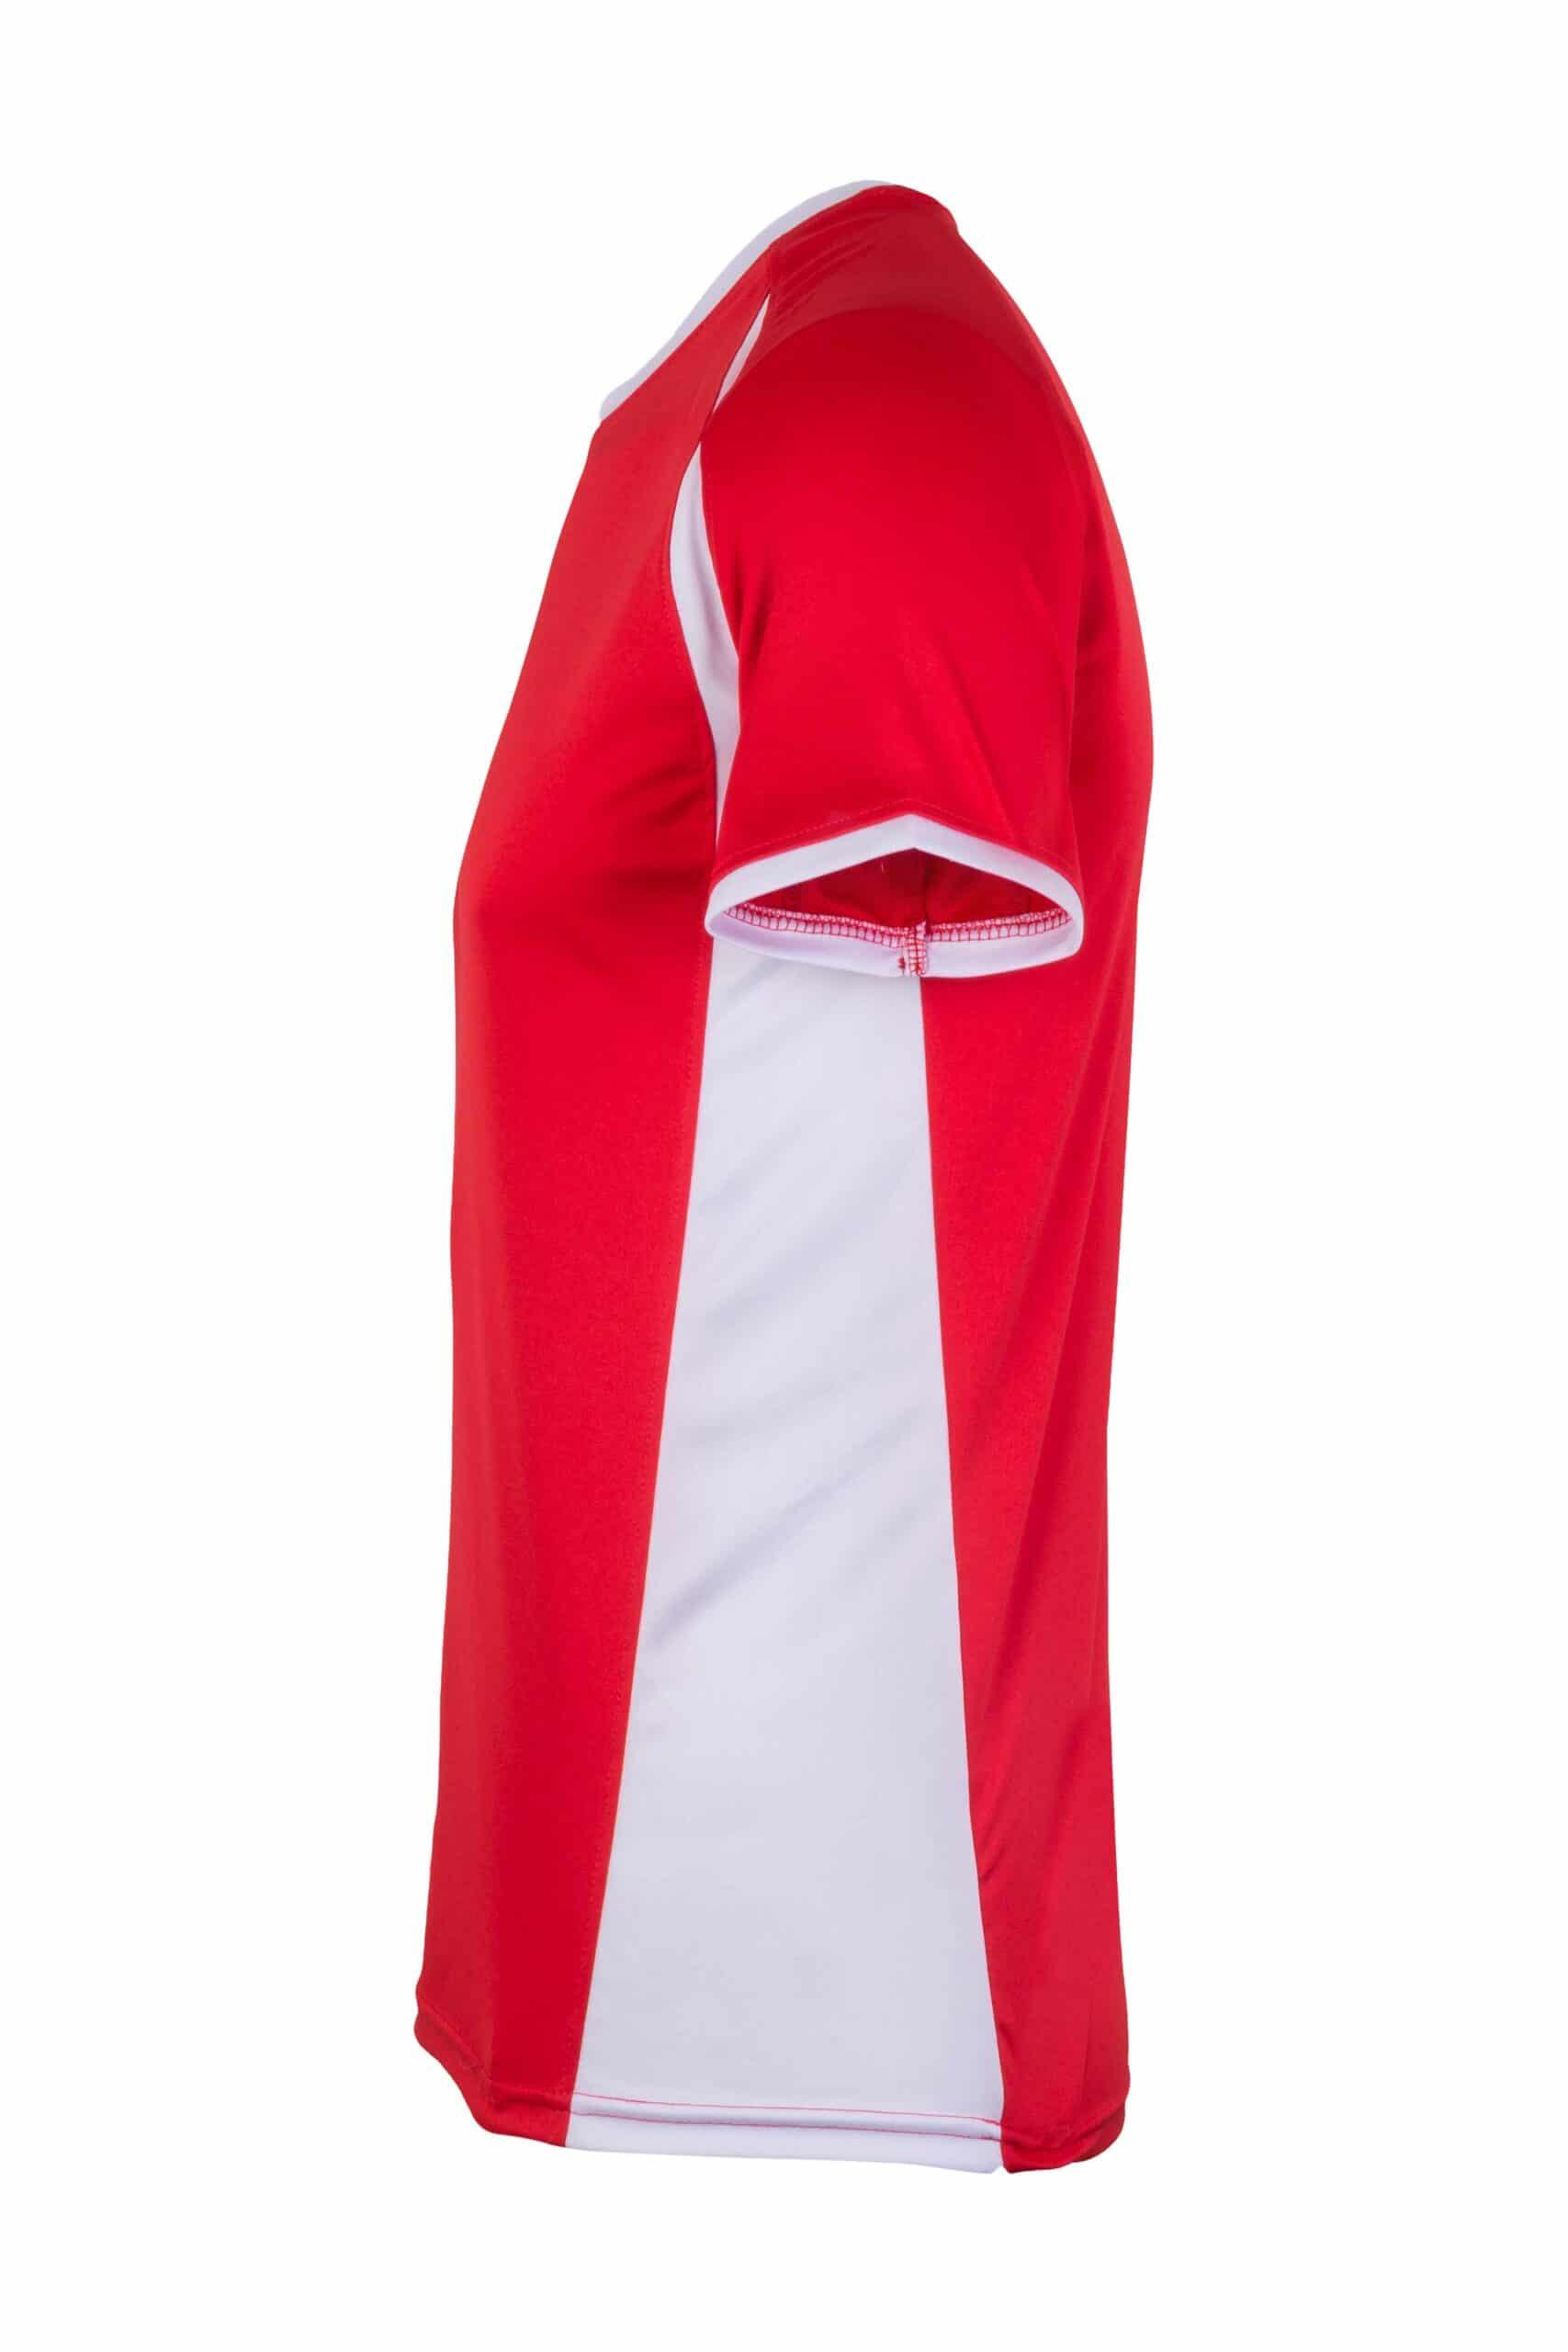 Mukua Mk530v Mukua Camiseta TÉcnica Manga Corta Bicolor Red White 3